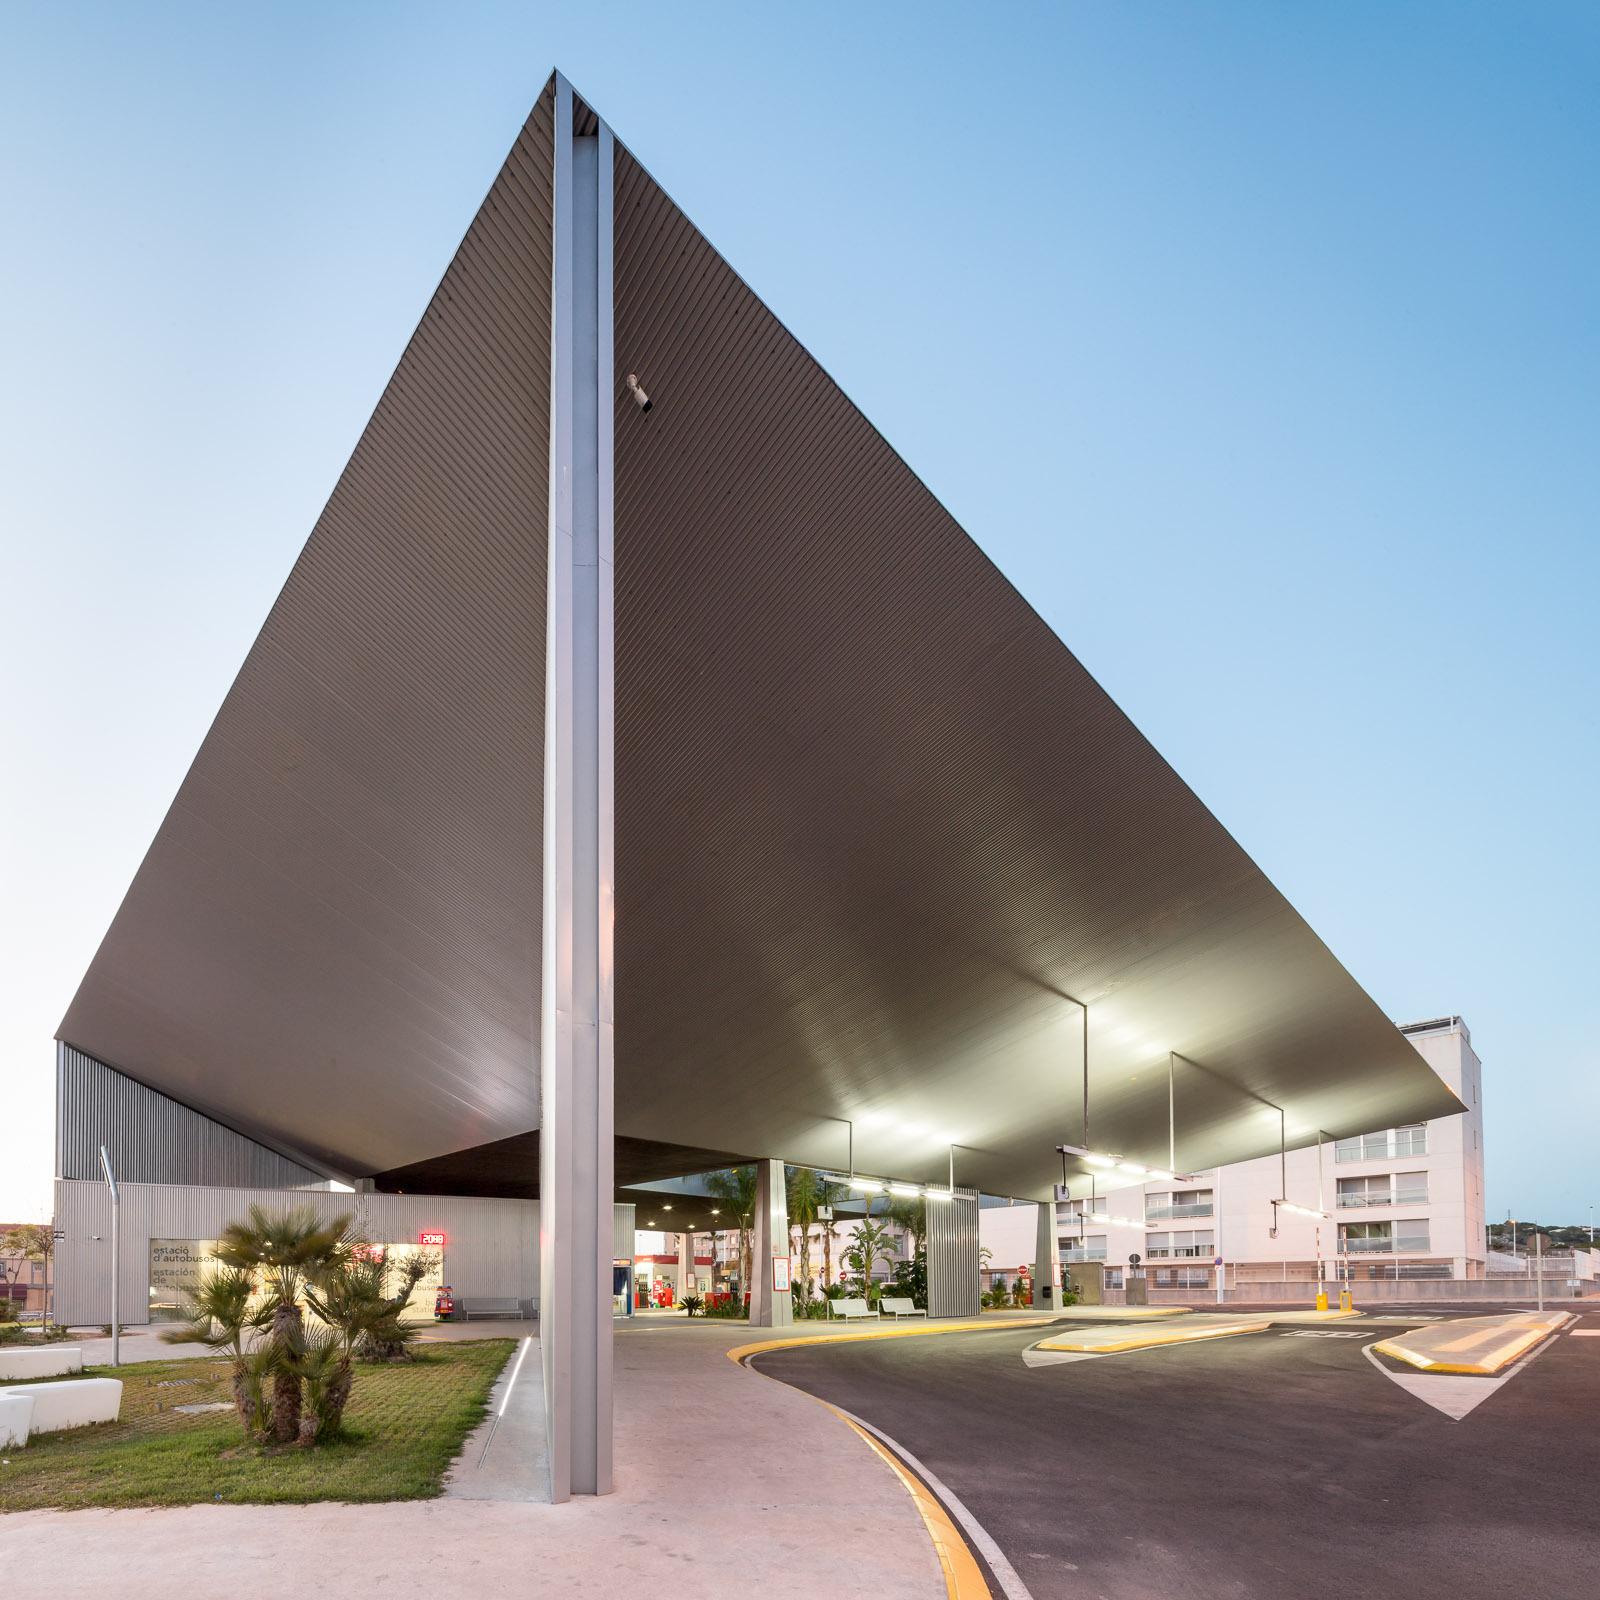 Estación de autobuses de Santa Pola / Manuel Lillo + Emilio Vicedo - Plataforma Arquitectura